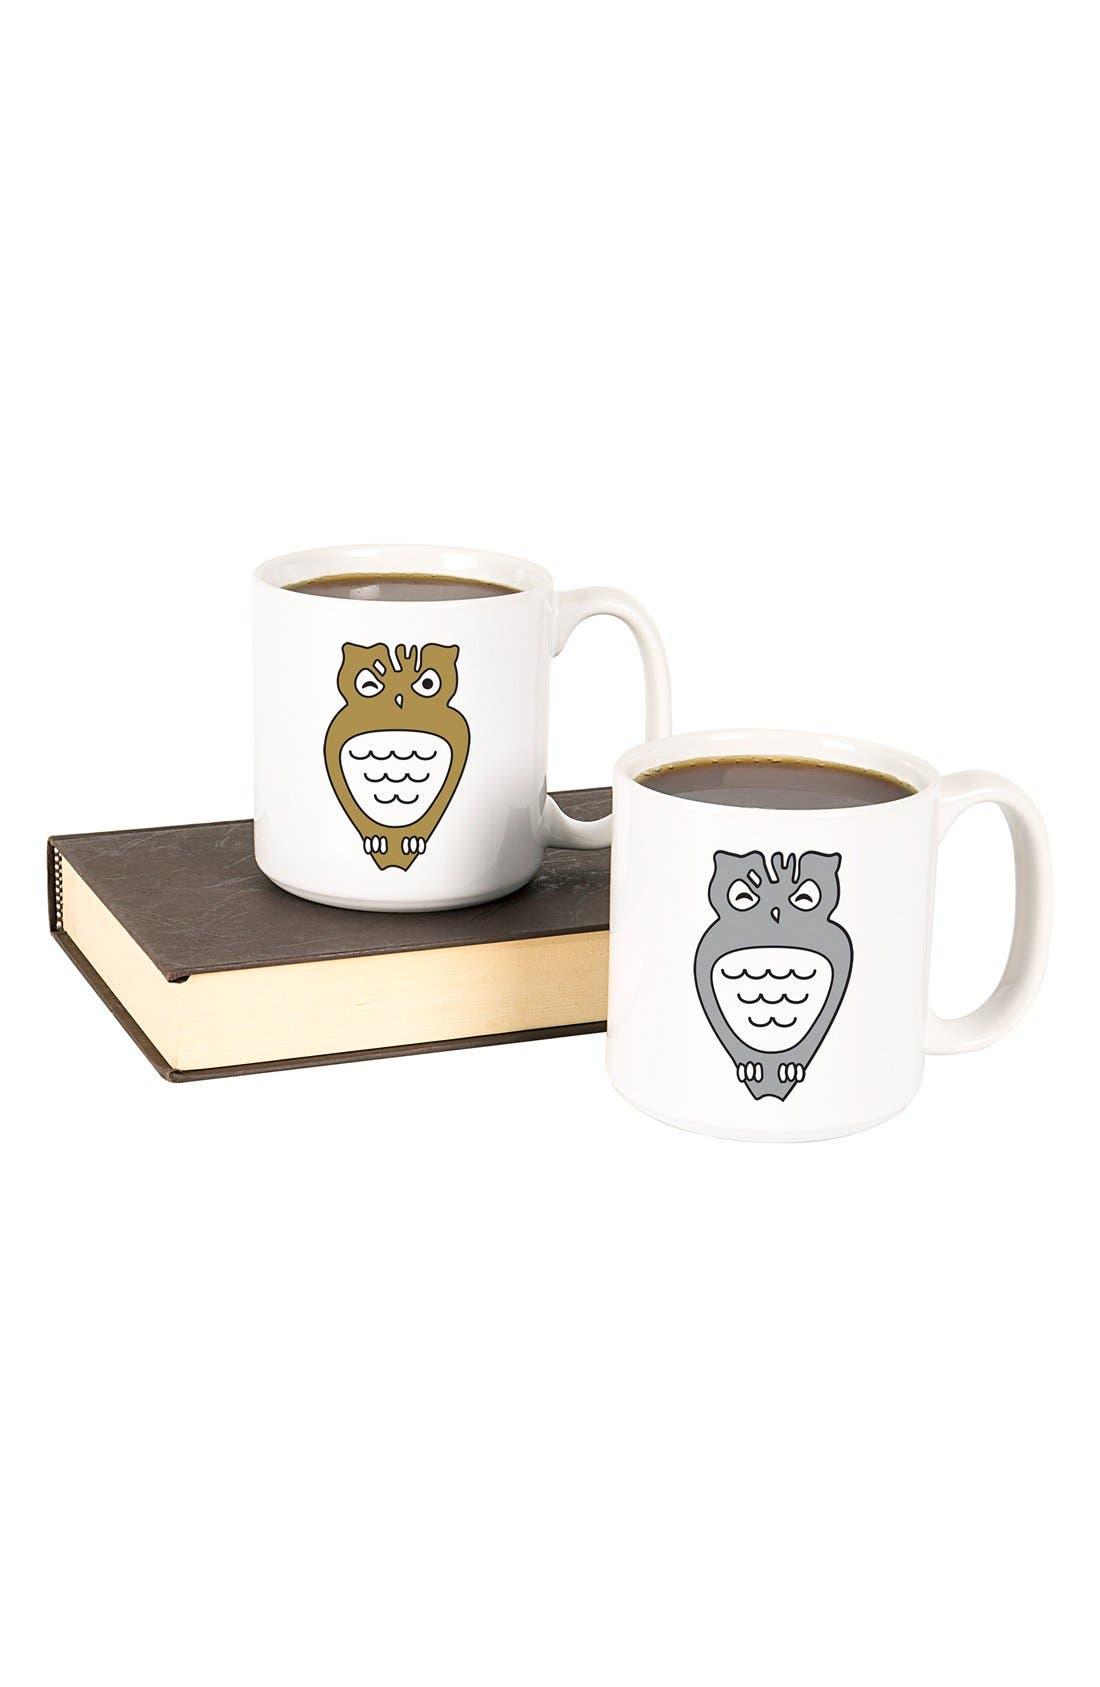 Main Image - Cathy's Concepts 'Owl' Ceramic Coffee Mugs (Set of 2)